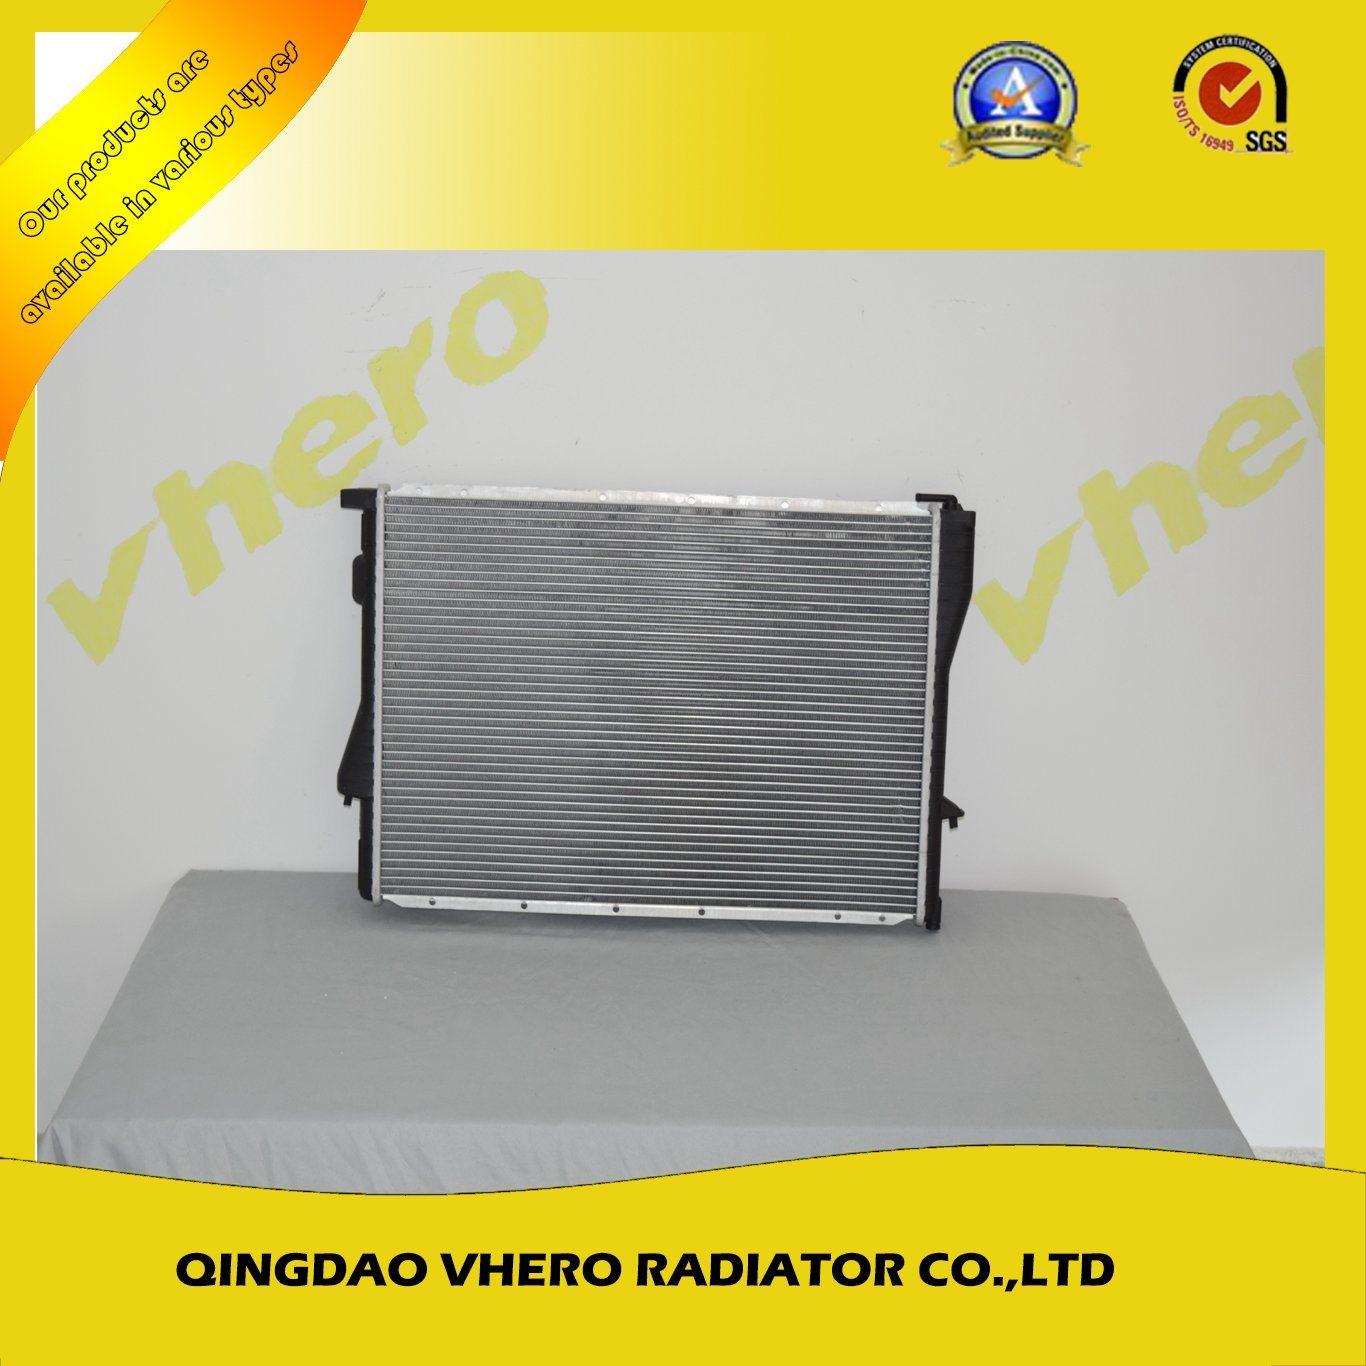 China Auto Spare Parts Radiator for BMW 528I/740I Base 96-98, OEM ...